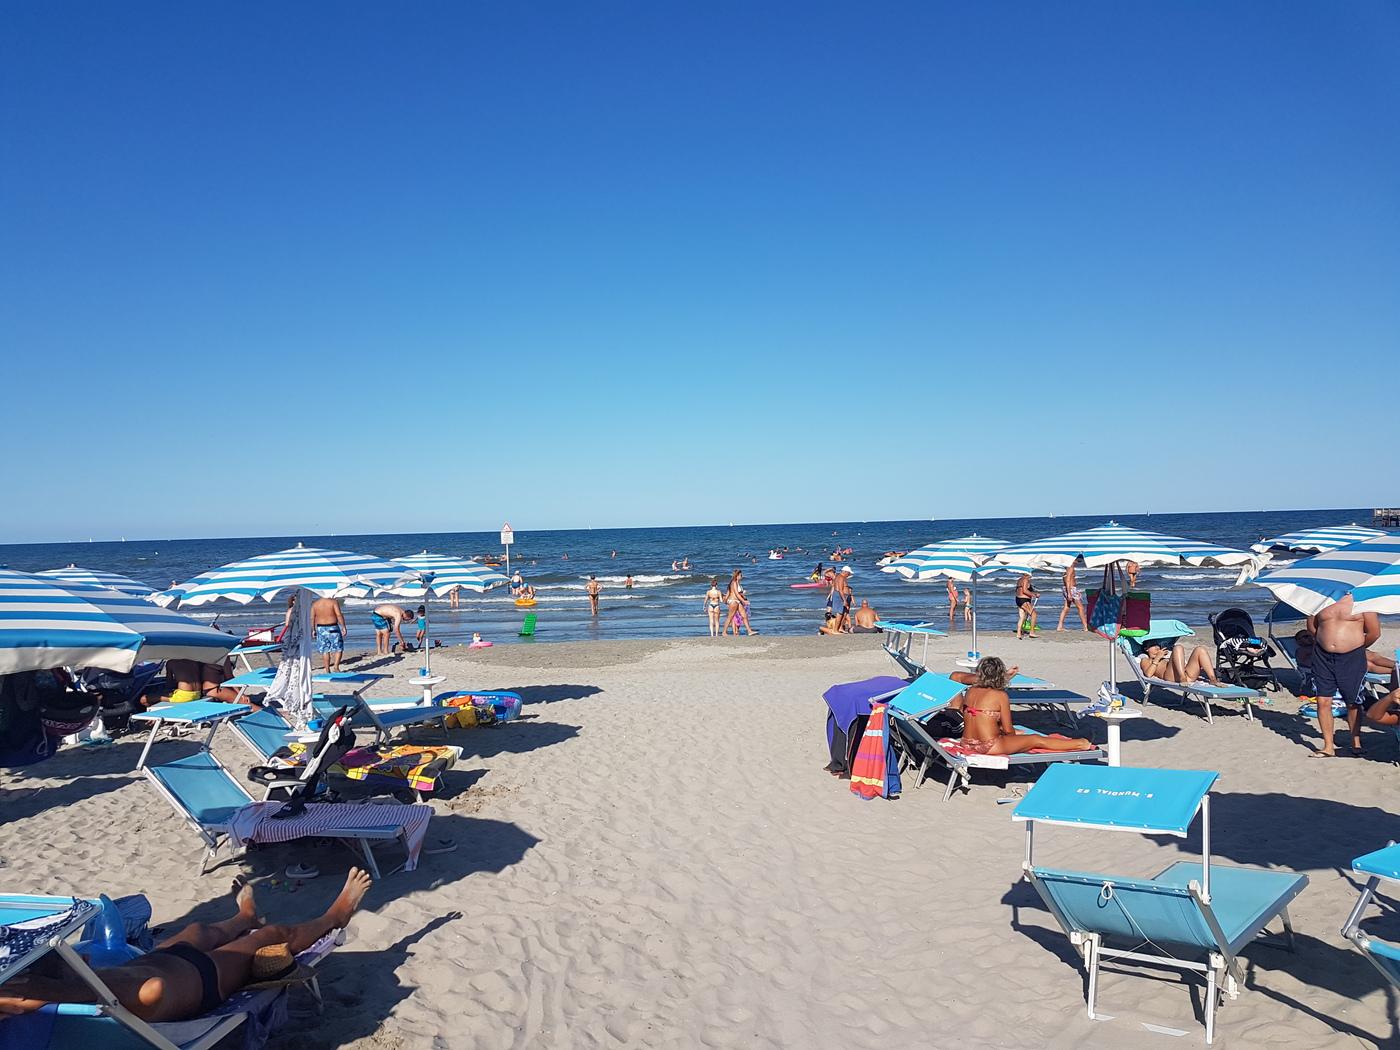 An Diesem Strand Geht Alles